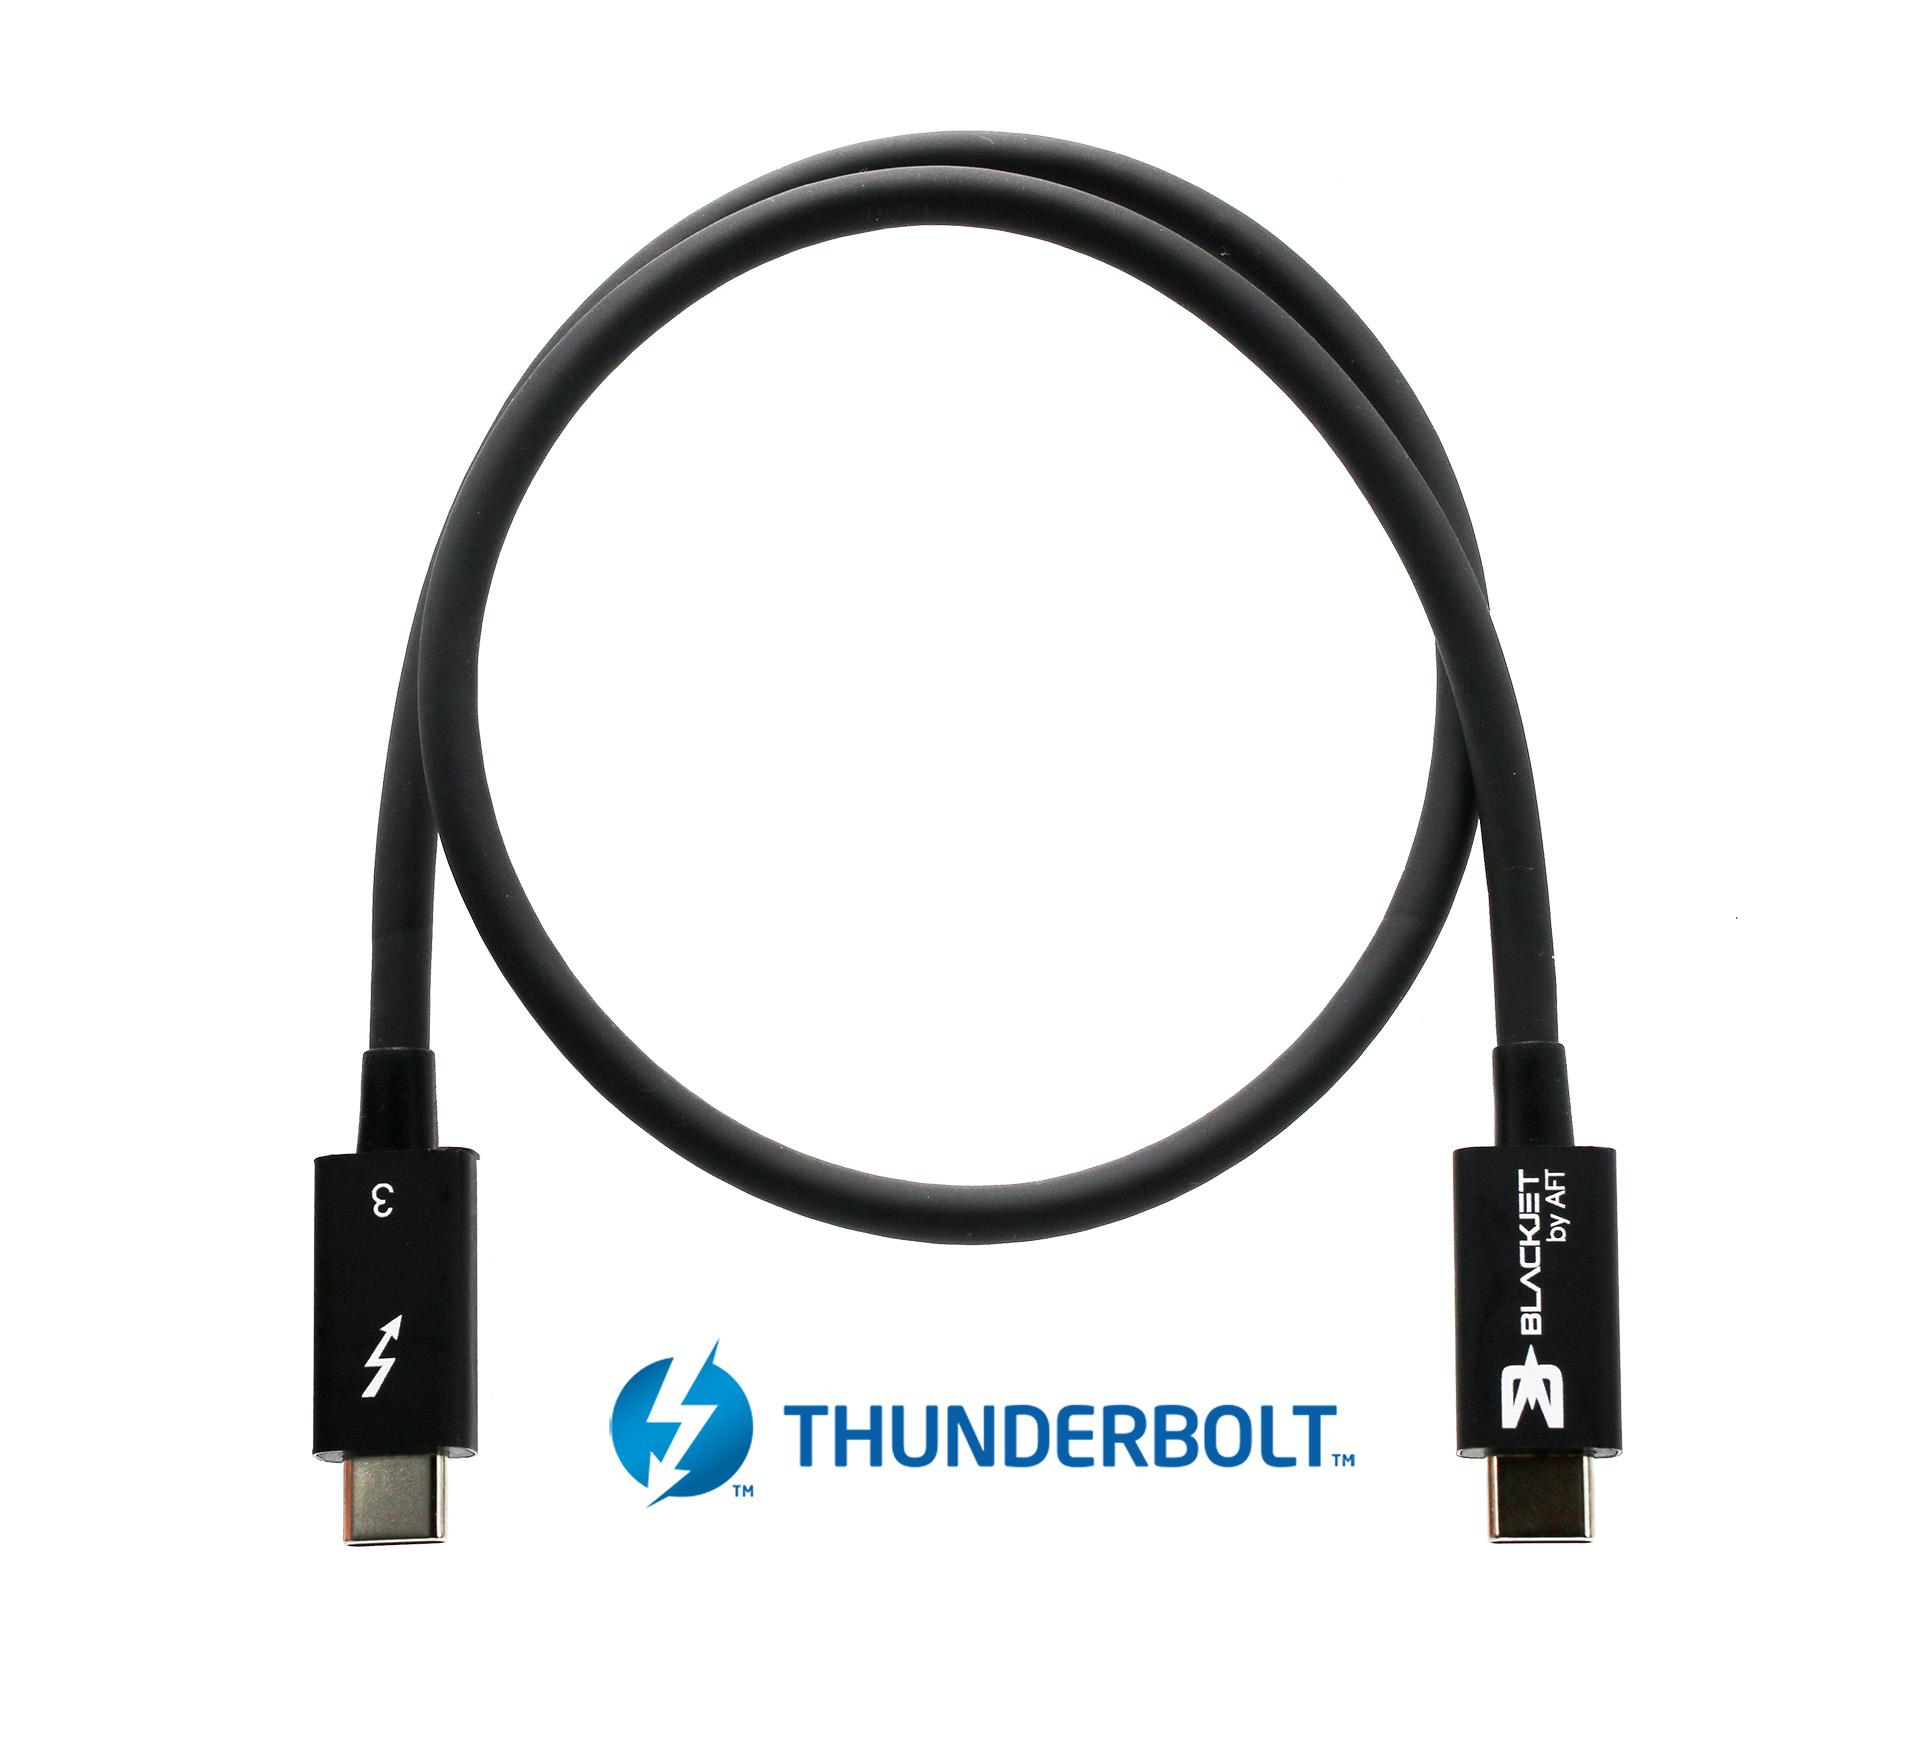 Blackjet Thunderbolt 3 Cable